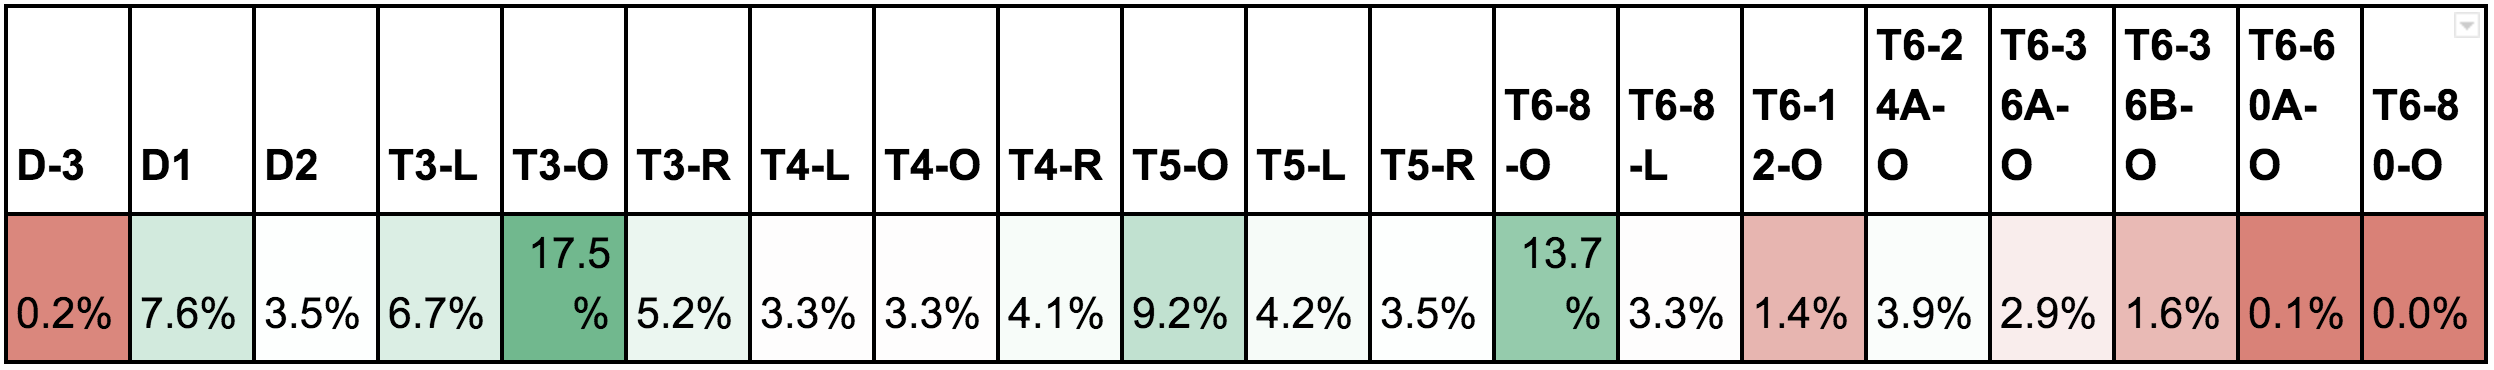 *percentage based on total vacant land parcels